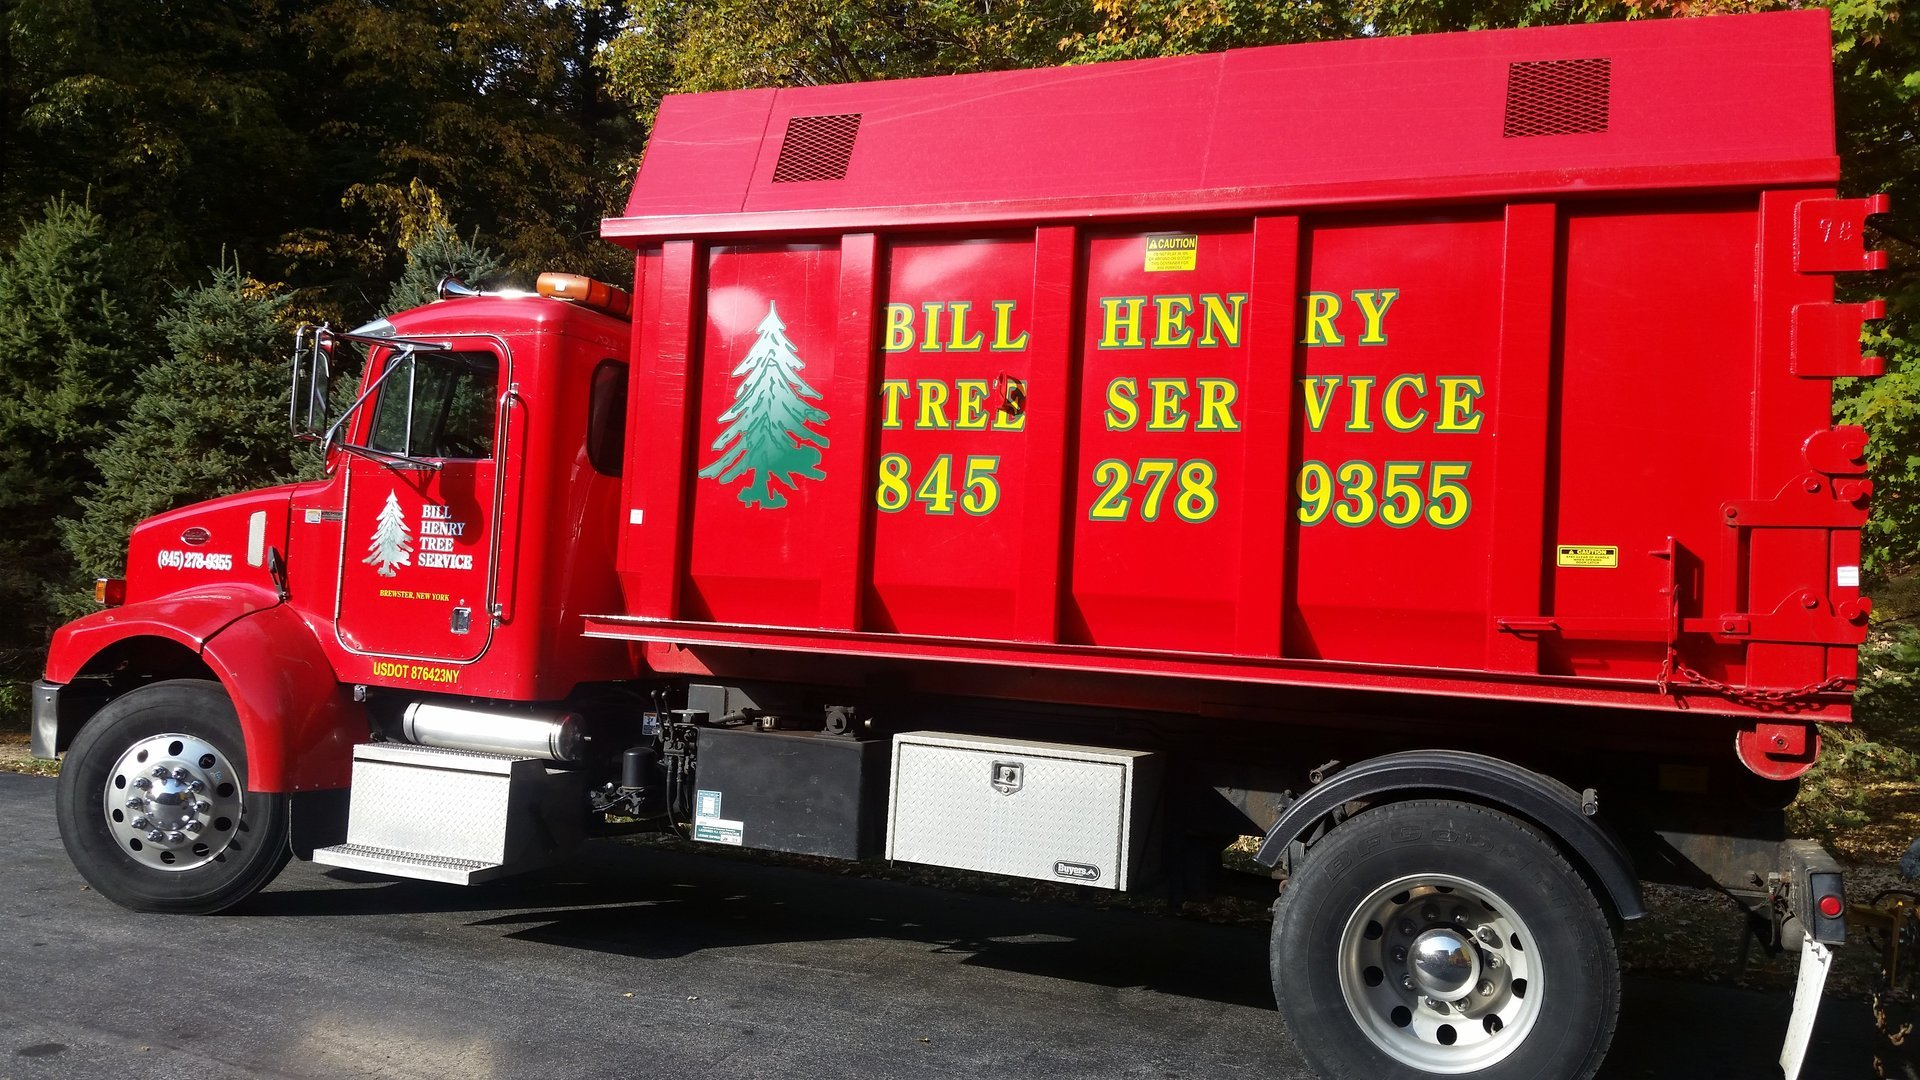 Bill Henry Tree Service truck